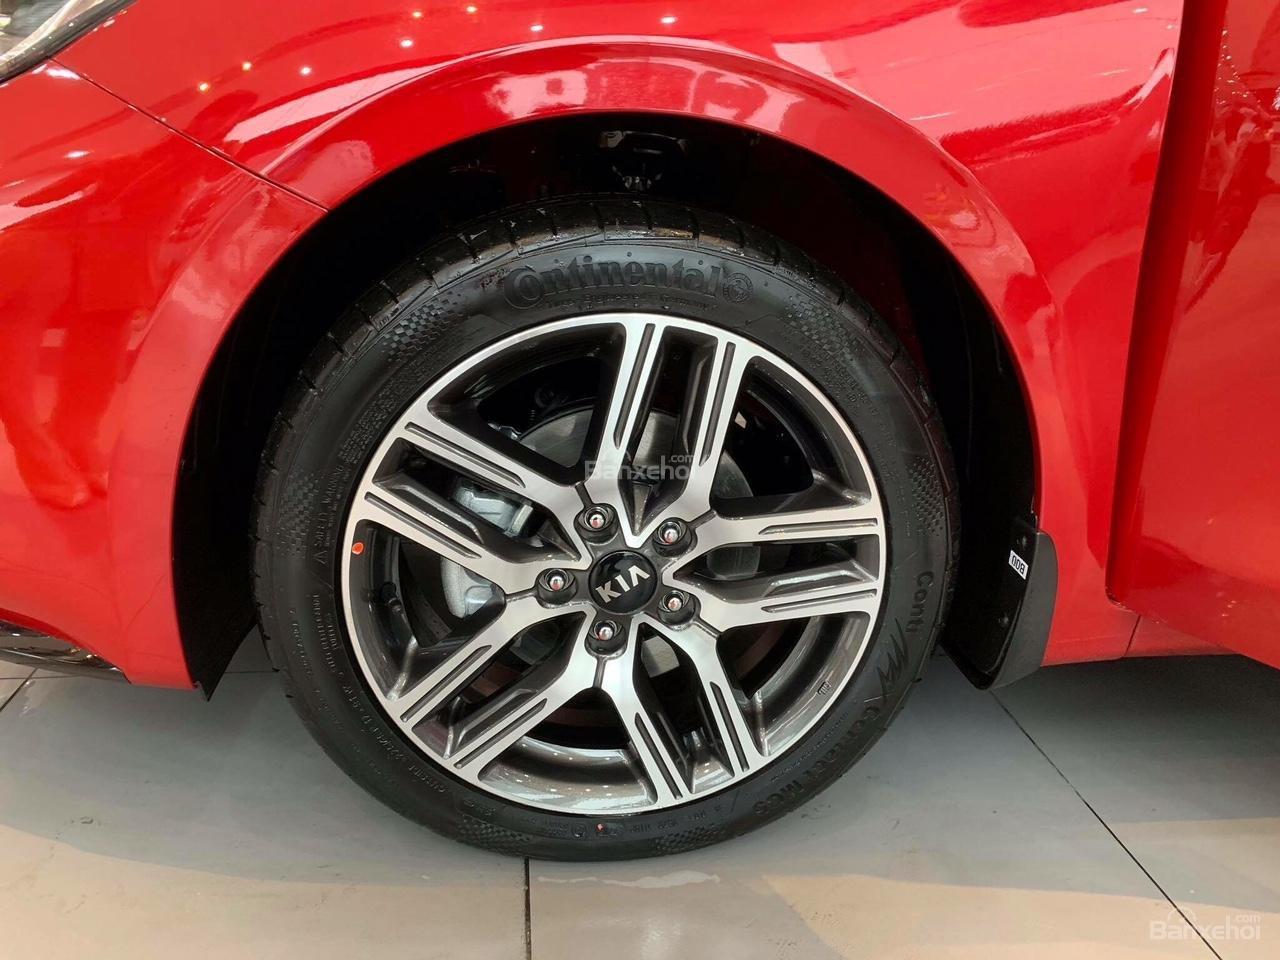 Bán Kia Cerato đời 2019 All New - Giao xe trước Tết-2